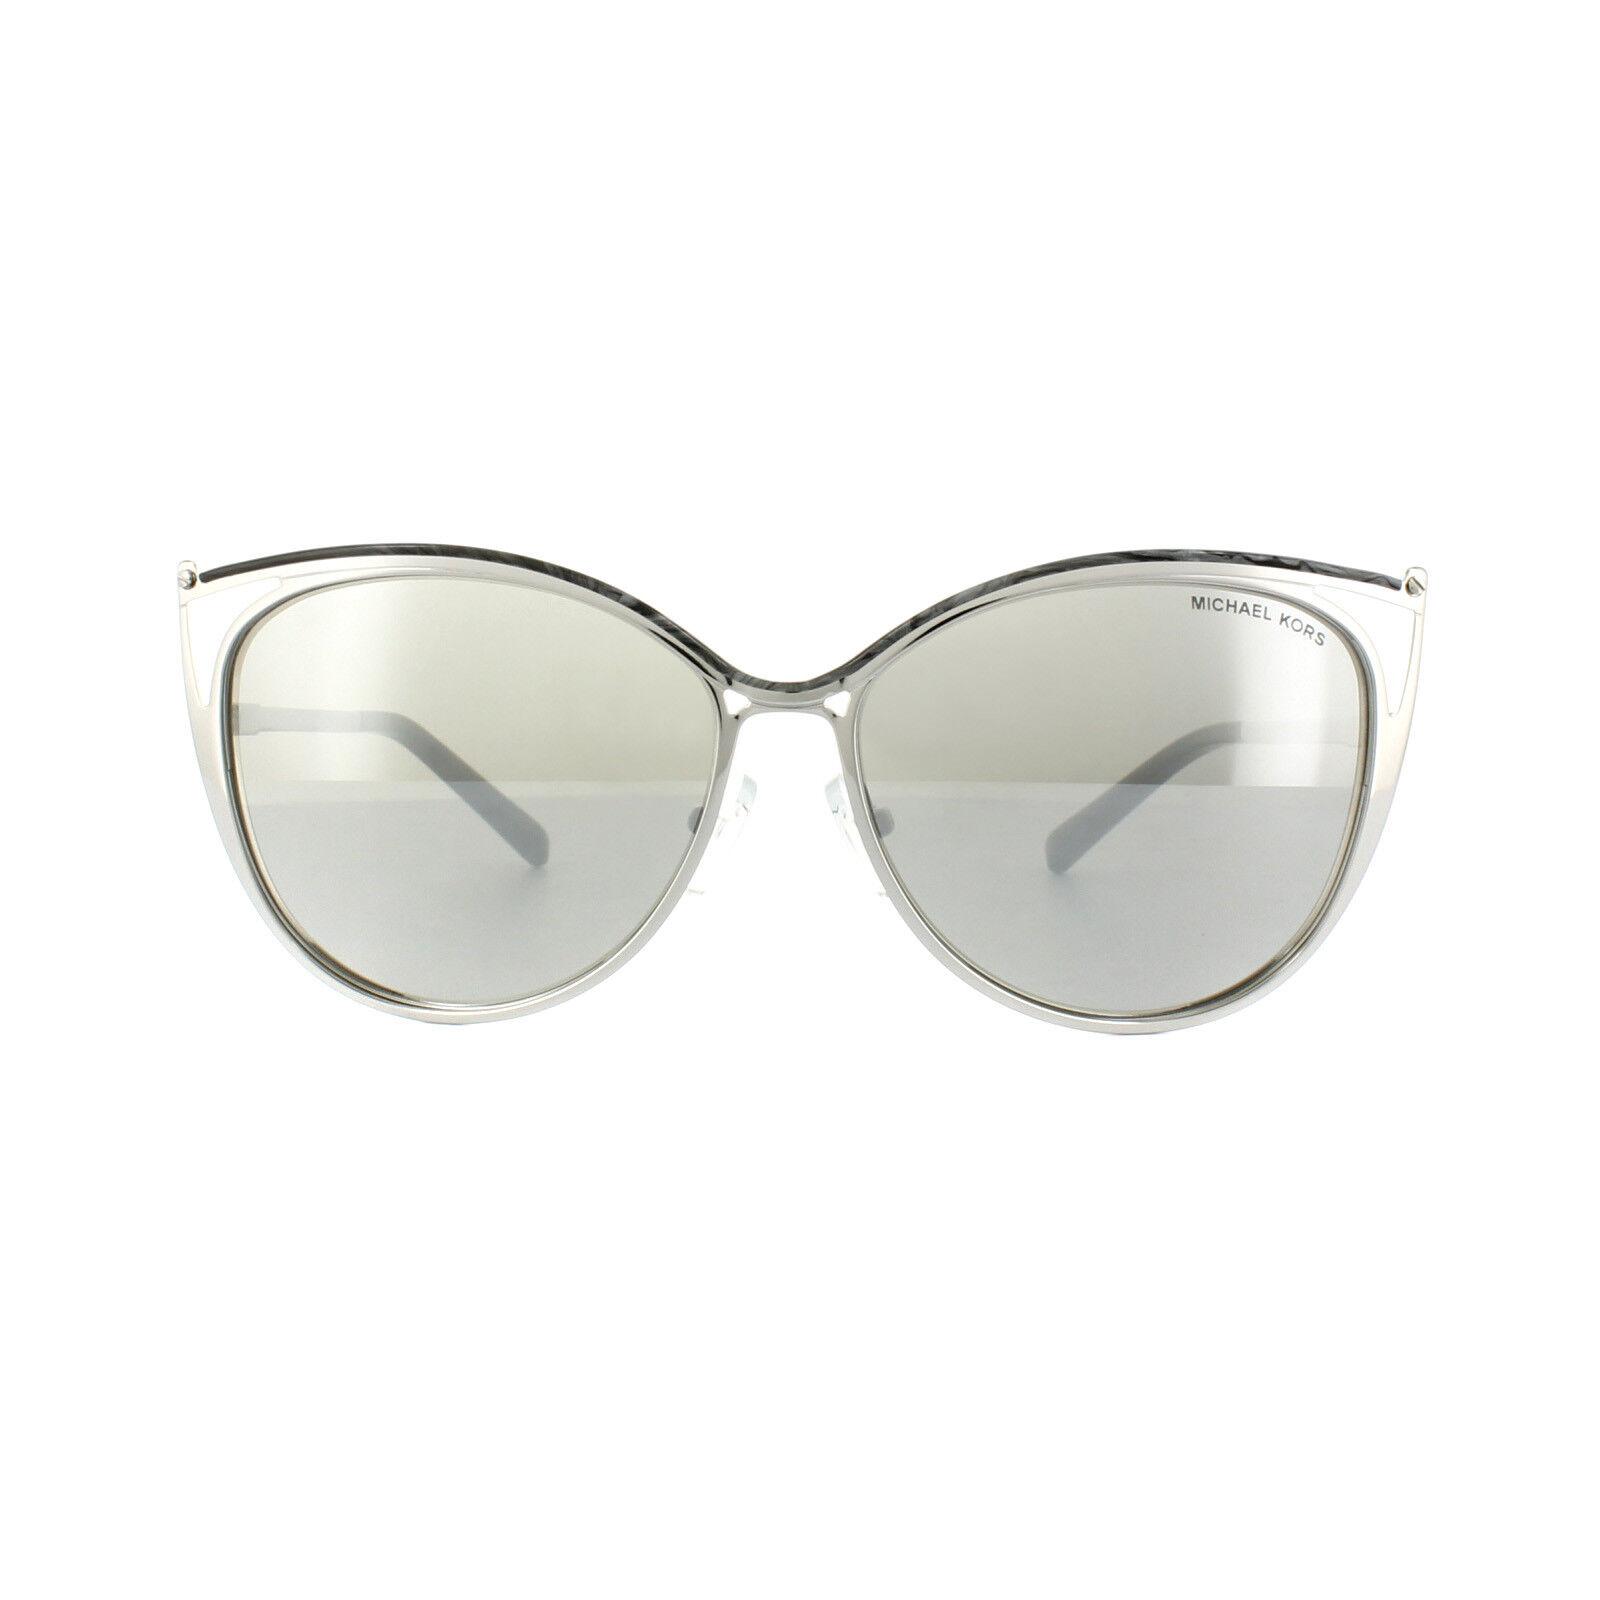 66aaf0b986b Michael Kors Sunglasses INA 1020 11666g Silver Silver Mirror